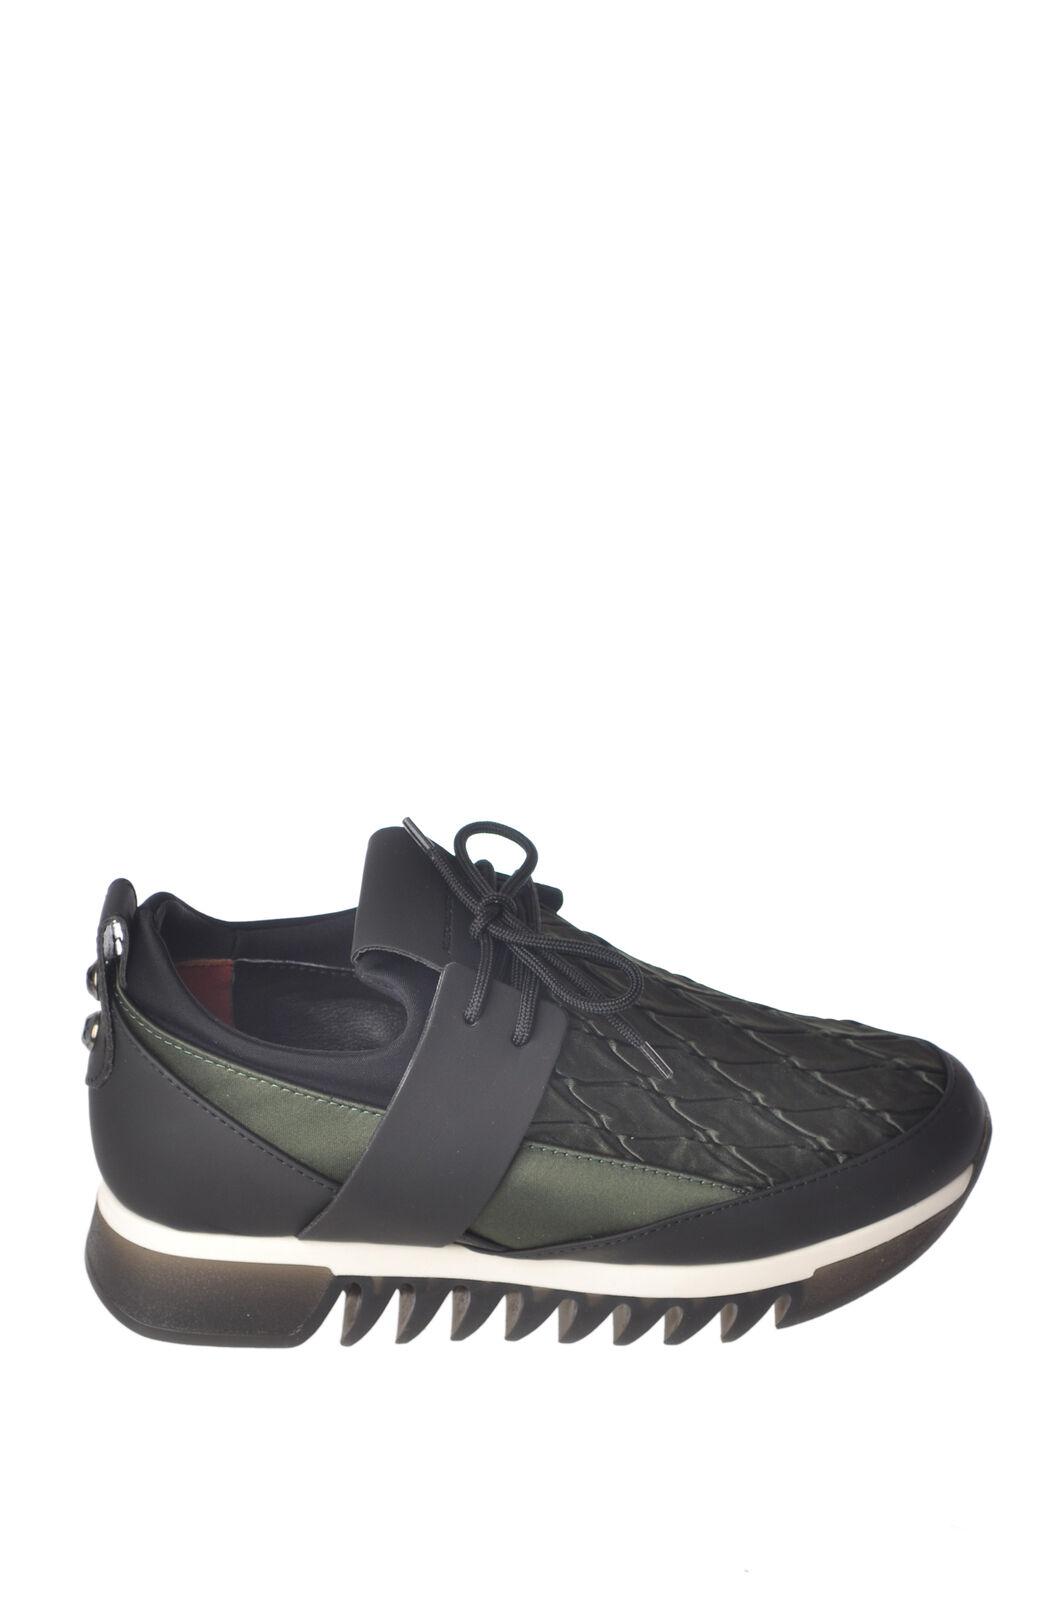 Alexander Smith - Scarpe-Sneakers basse - Donna - Verde - 4204827H184538